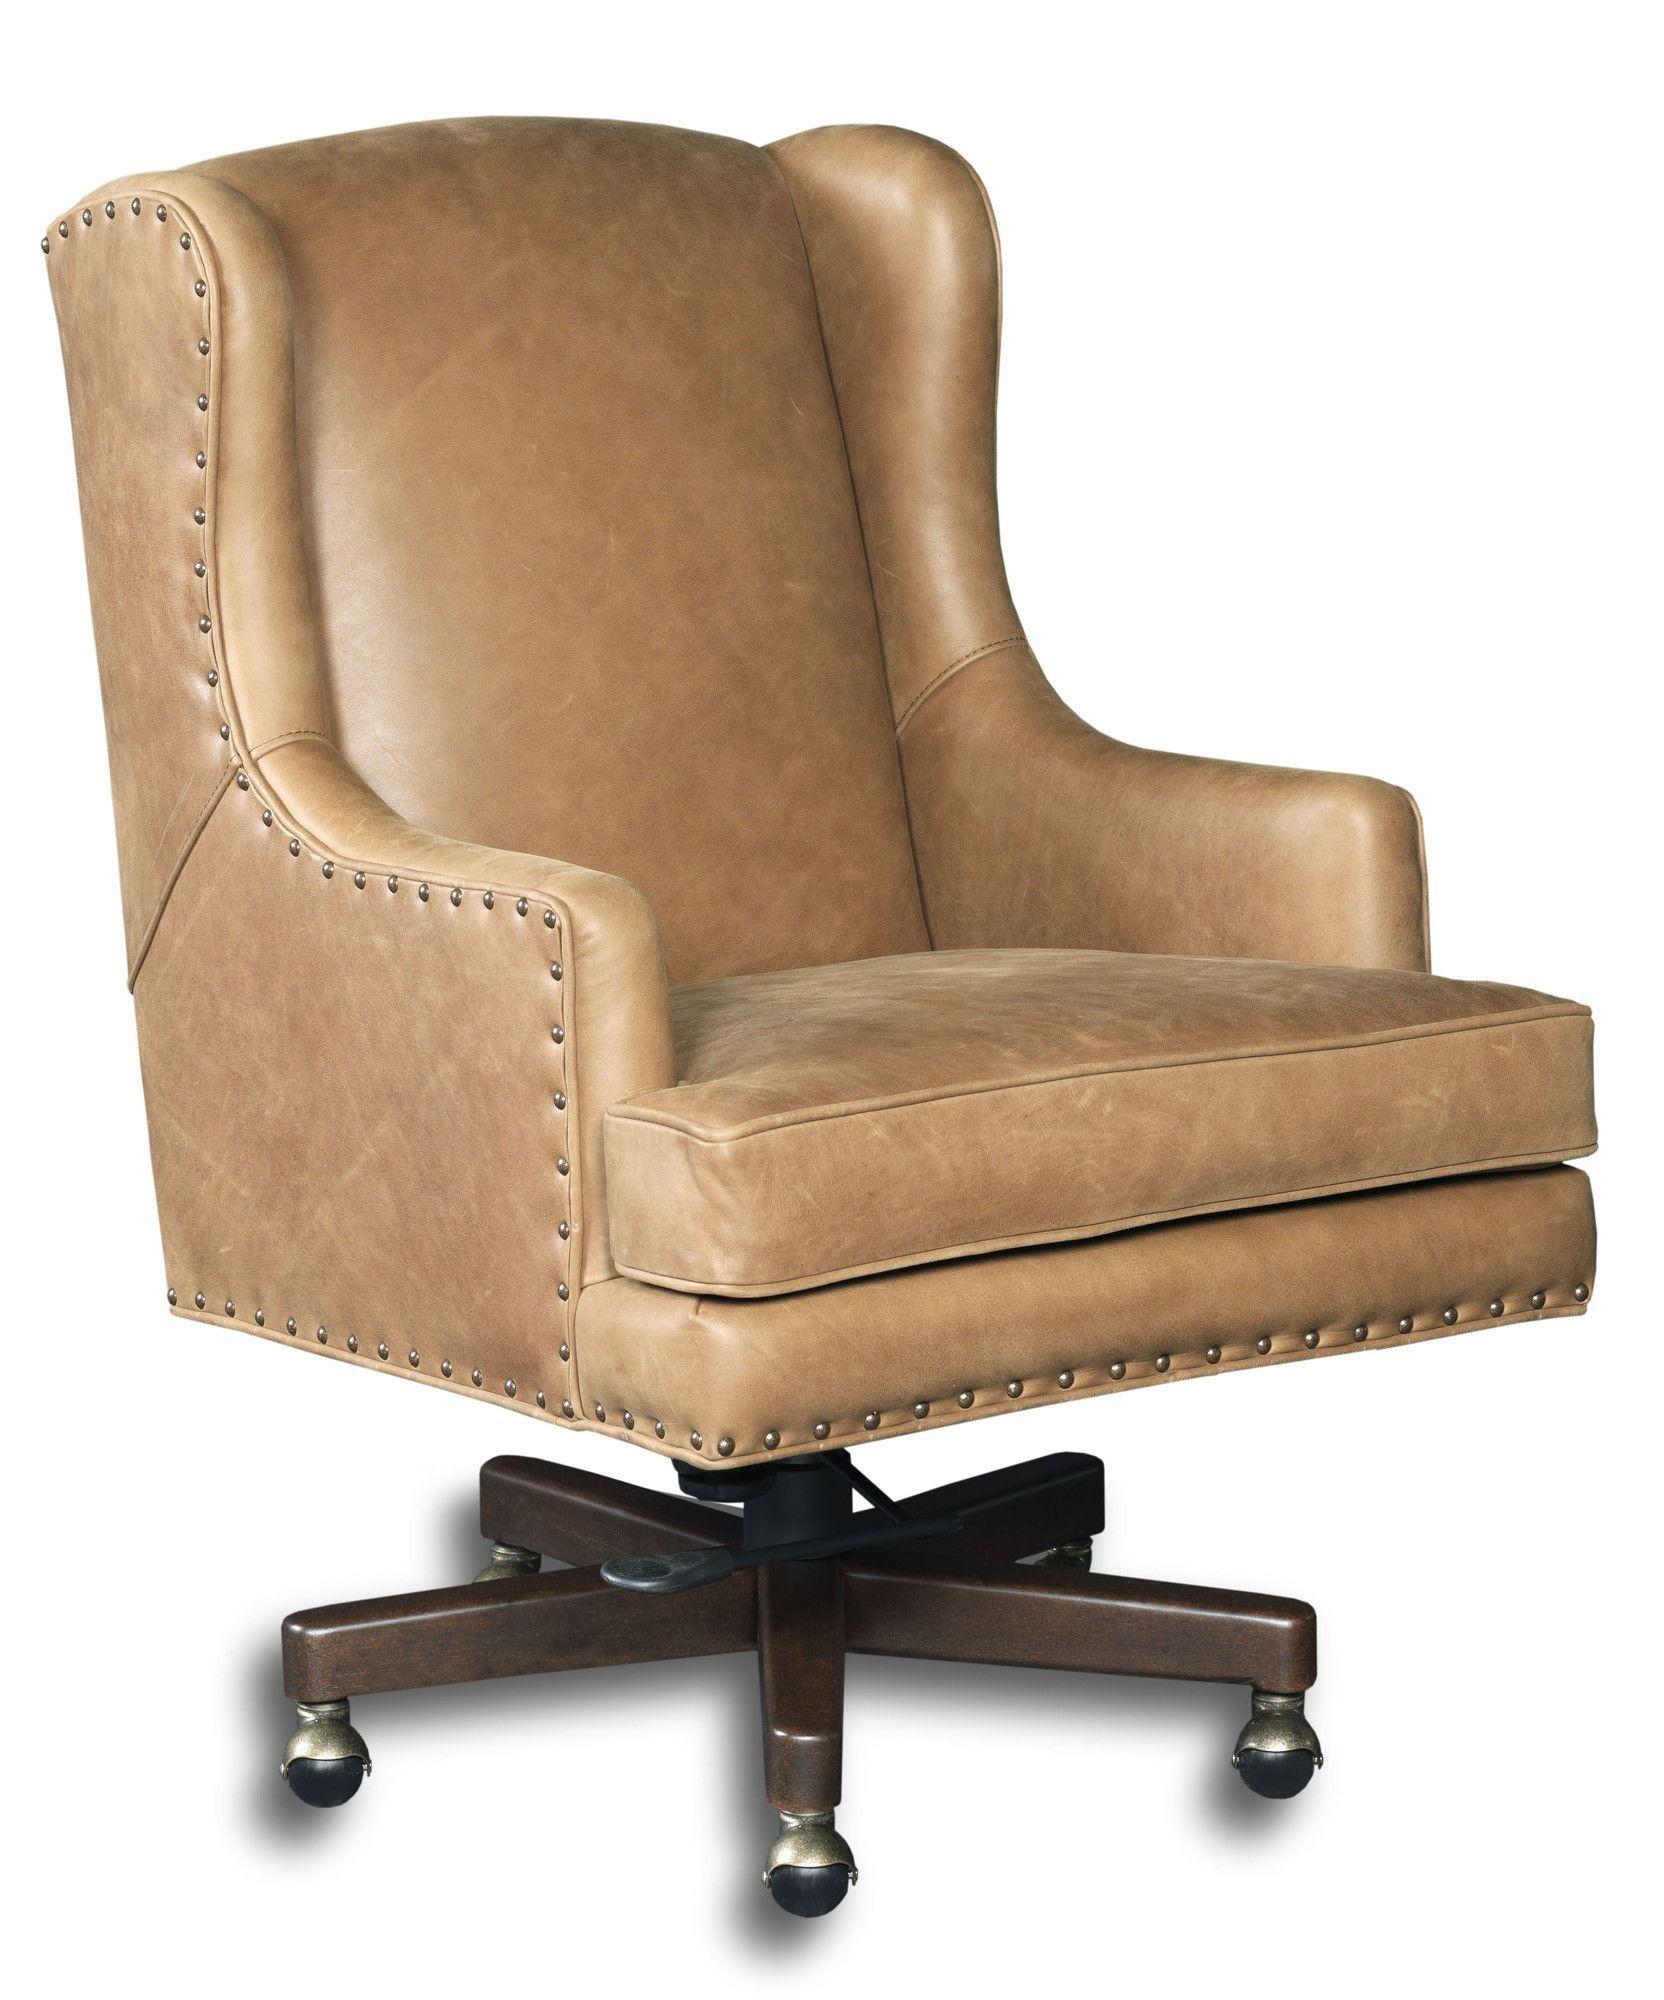 Wrenshall Social Mid Century Side Chair Chair Furniture Home